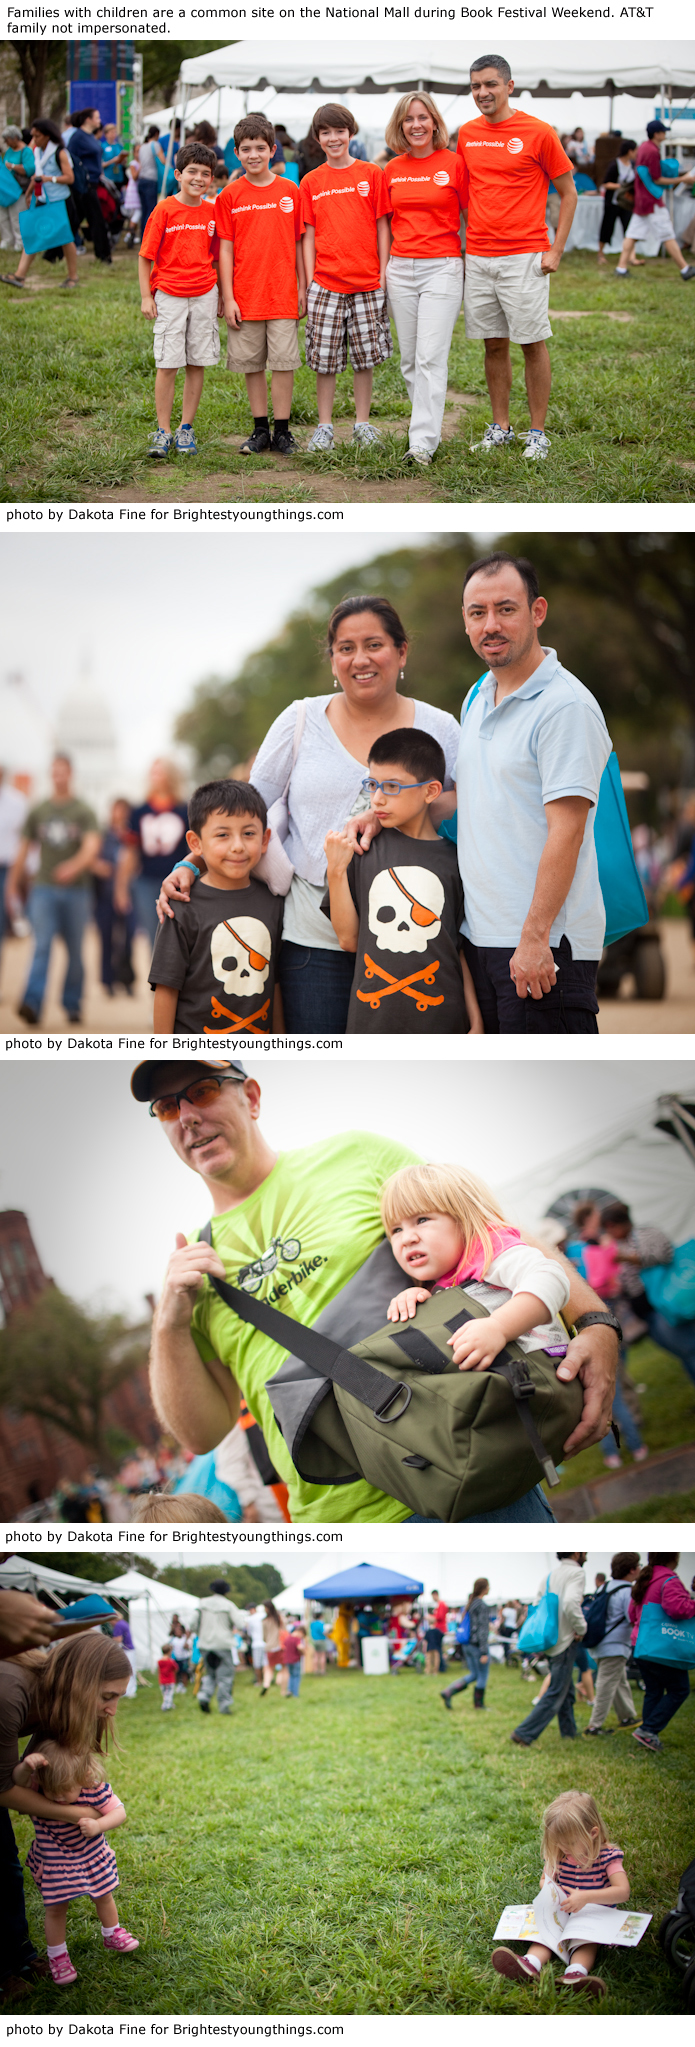 DF11_9.25_Families